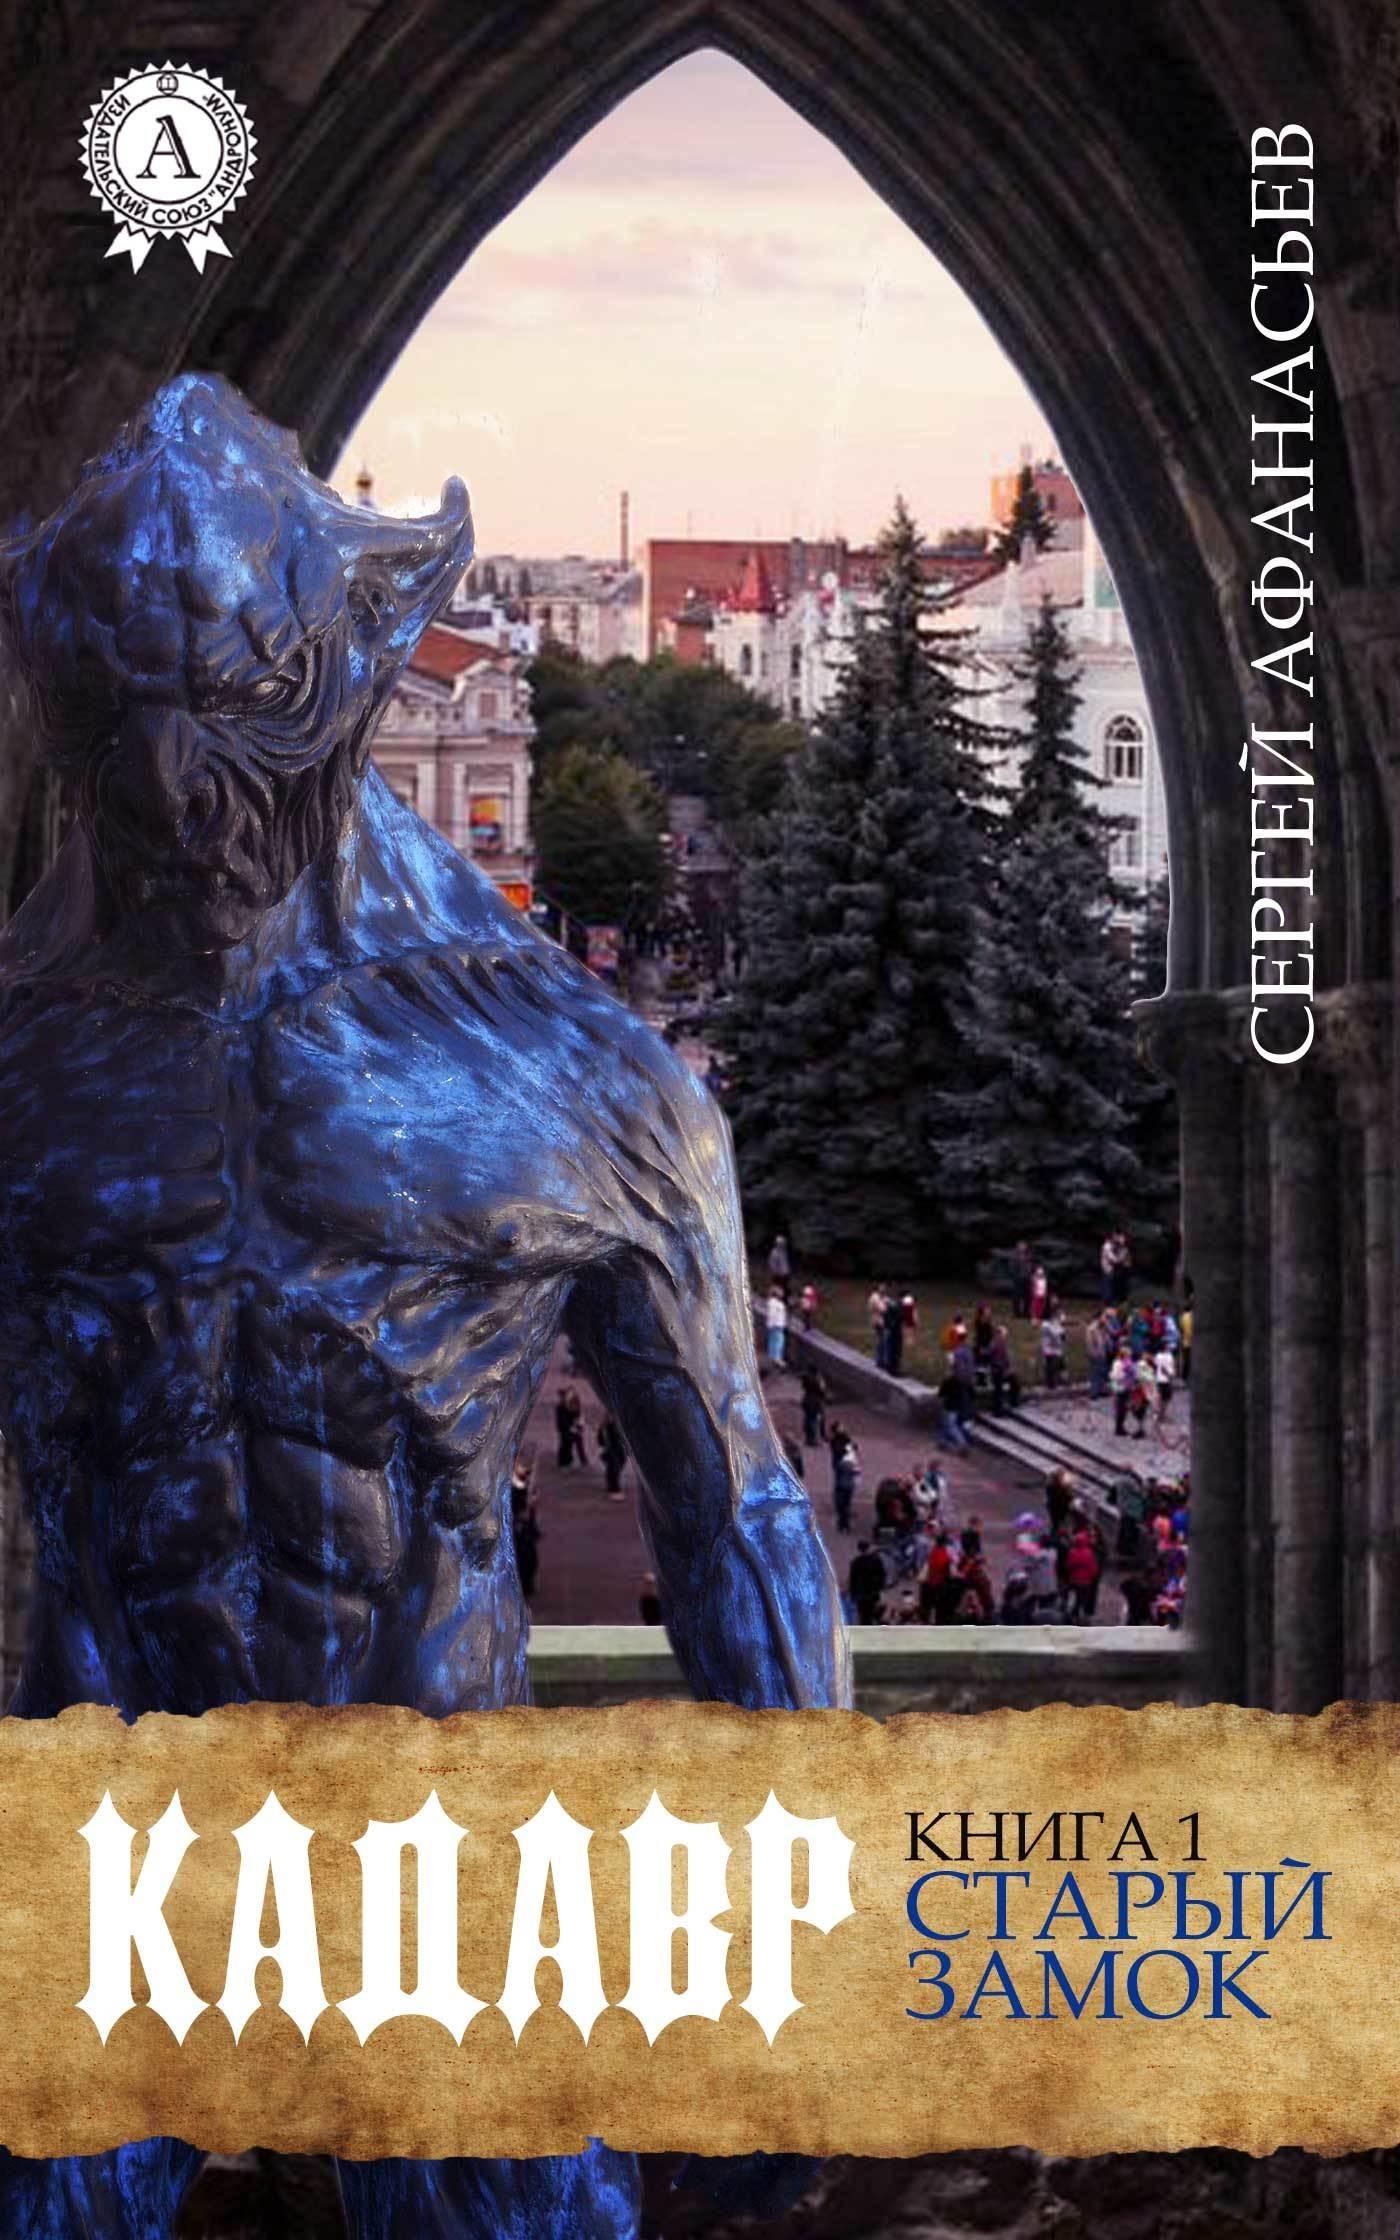 Сергей Афанасьев - Старый замок